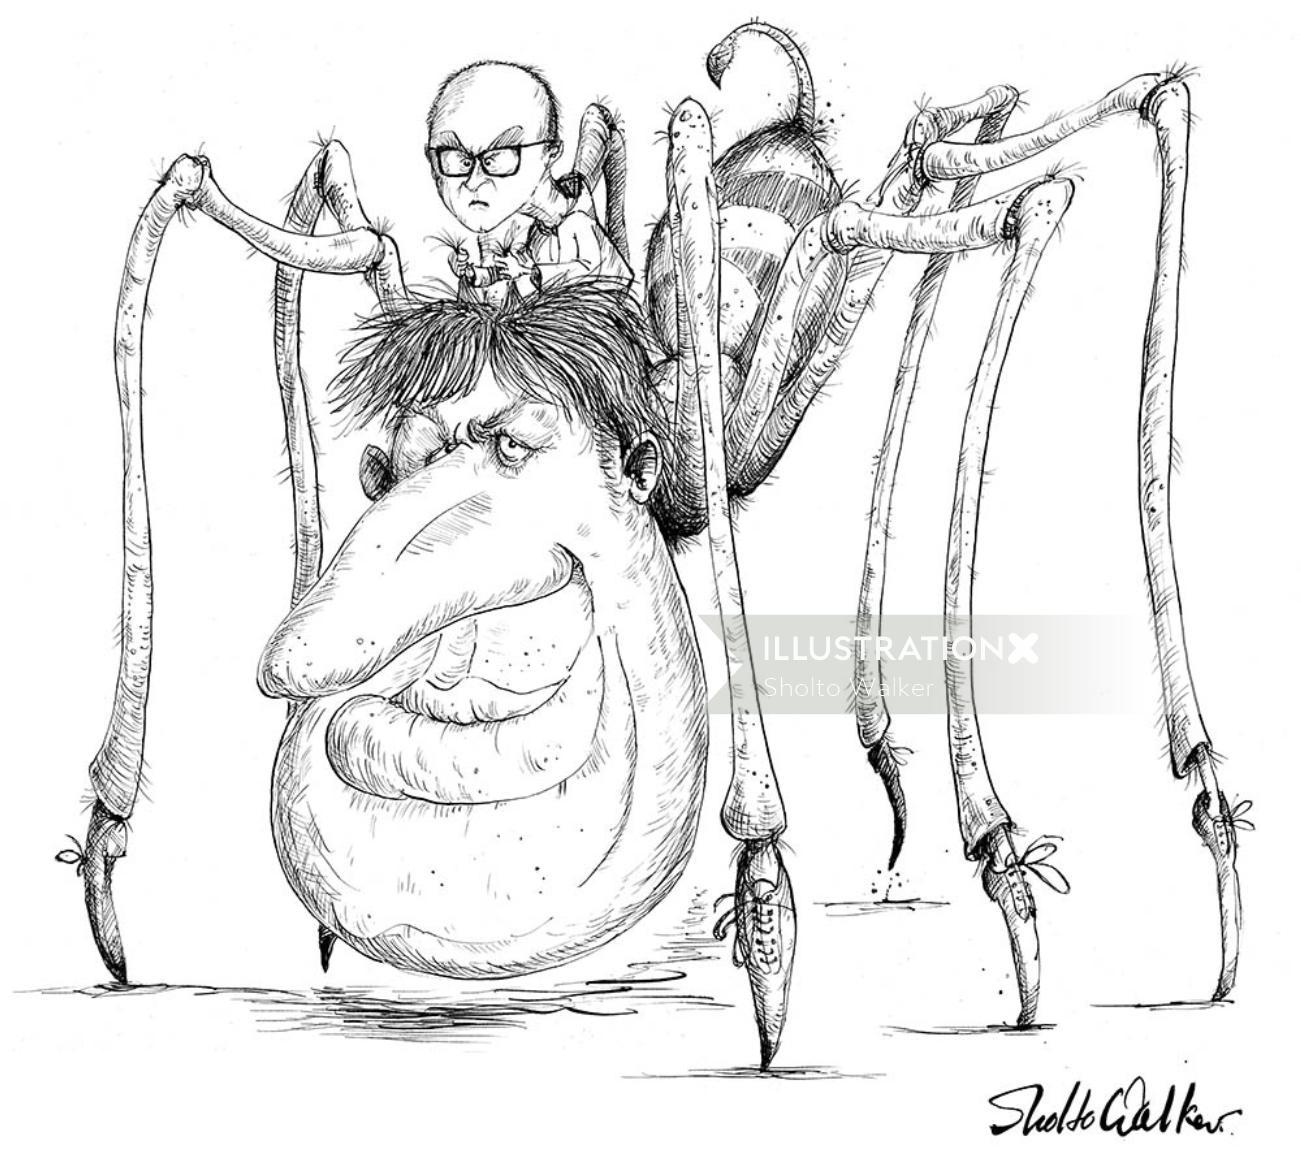 Hideous spider comic illustration